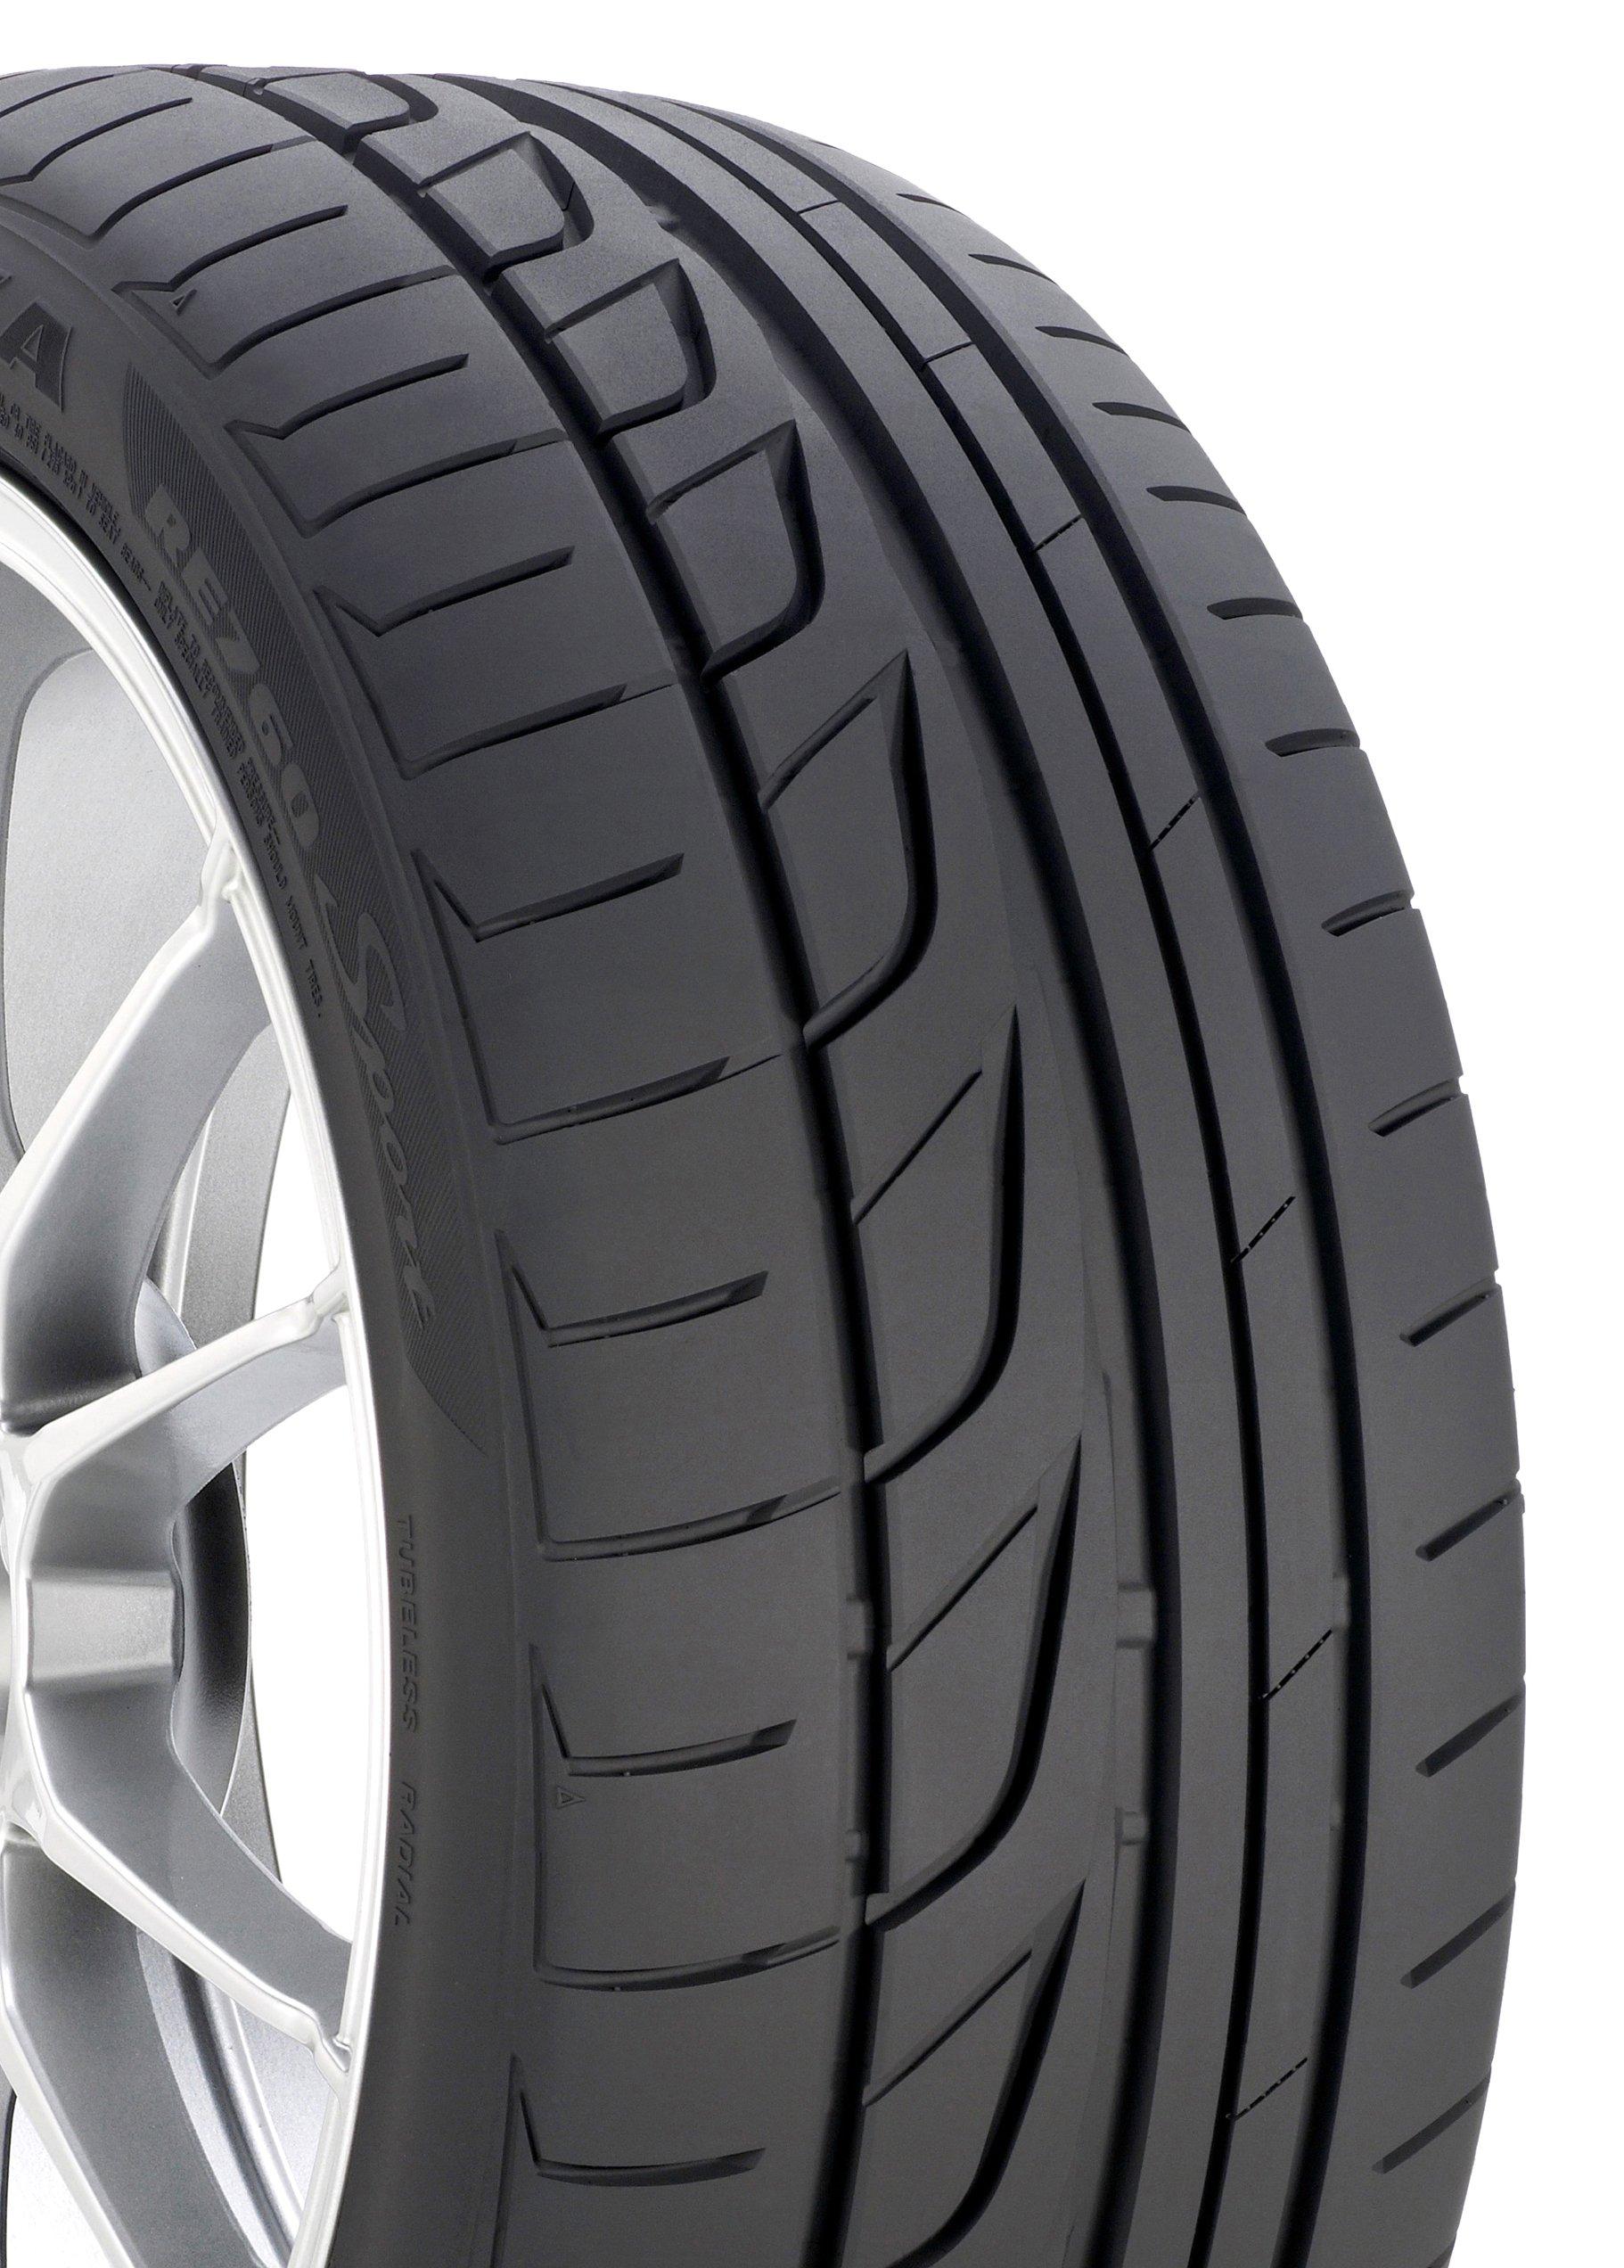 Bridgestone Potenza RE760 Sport Performance Radial Tire - 225/45R18 91W